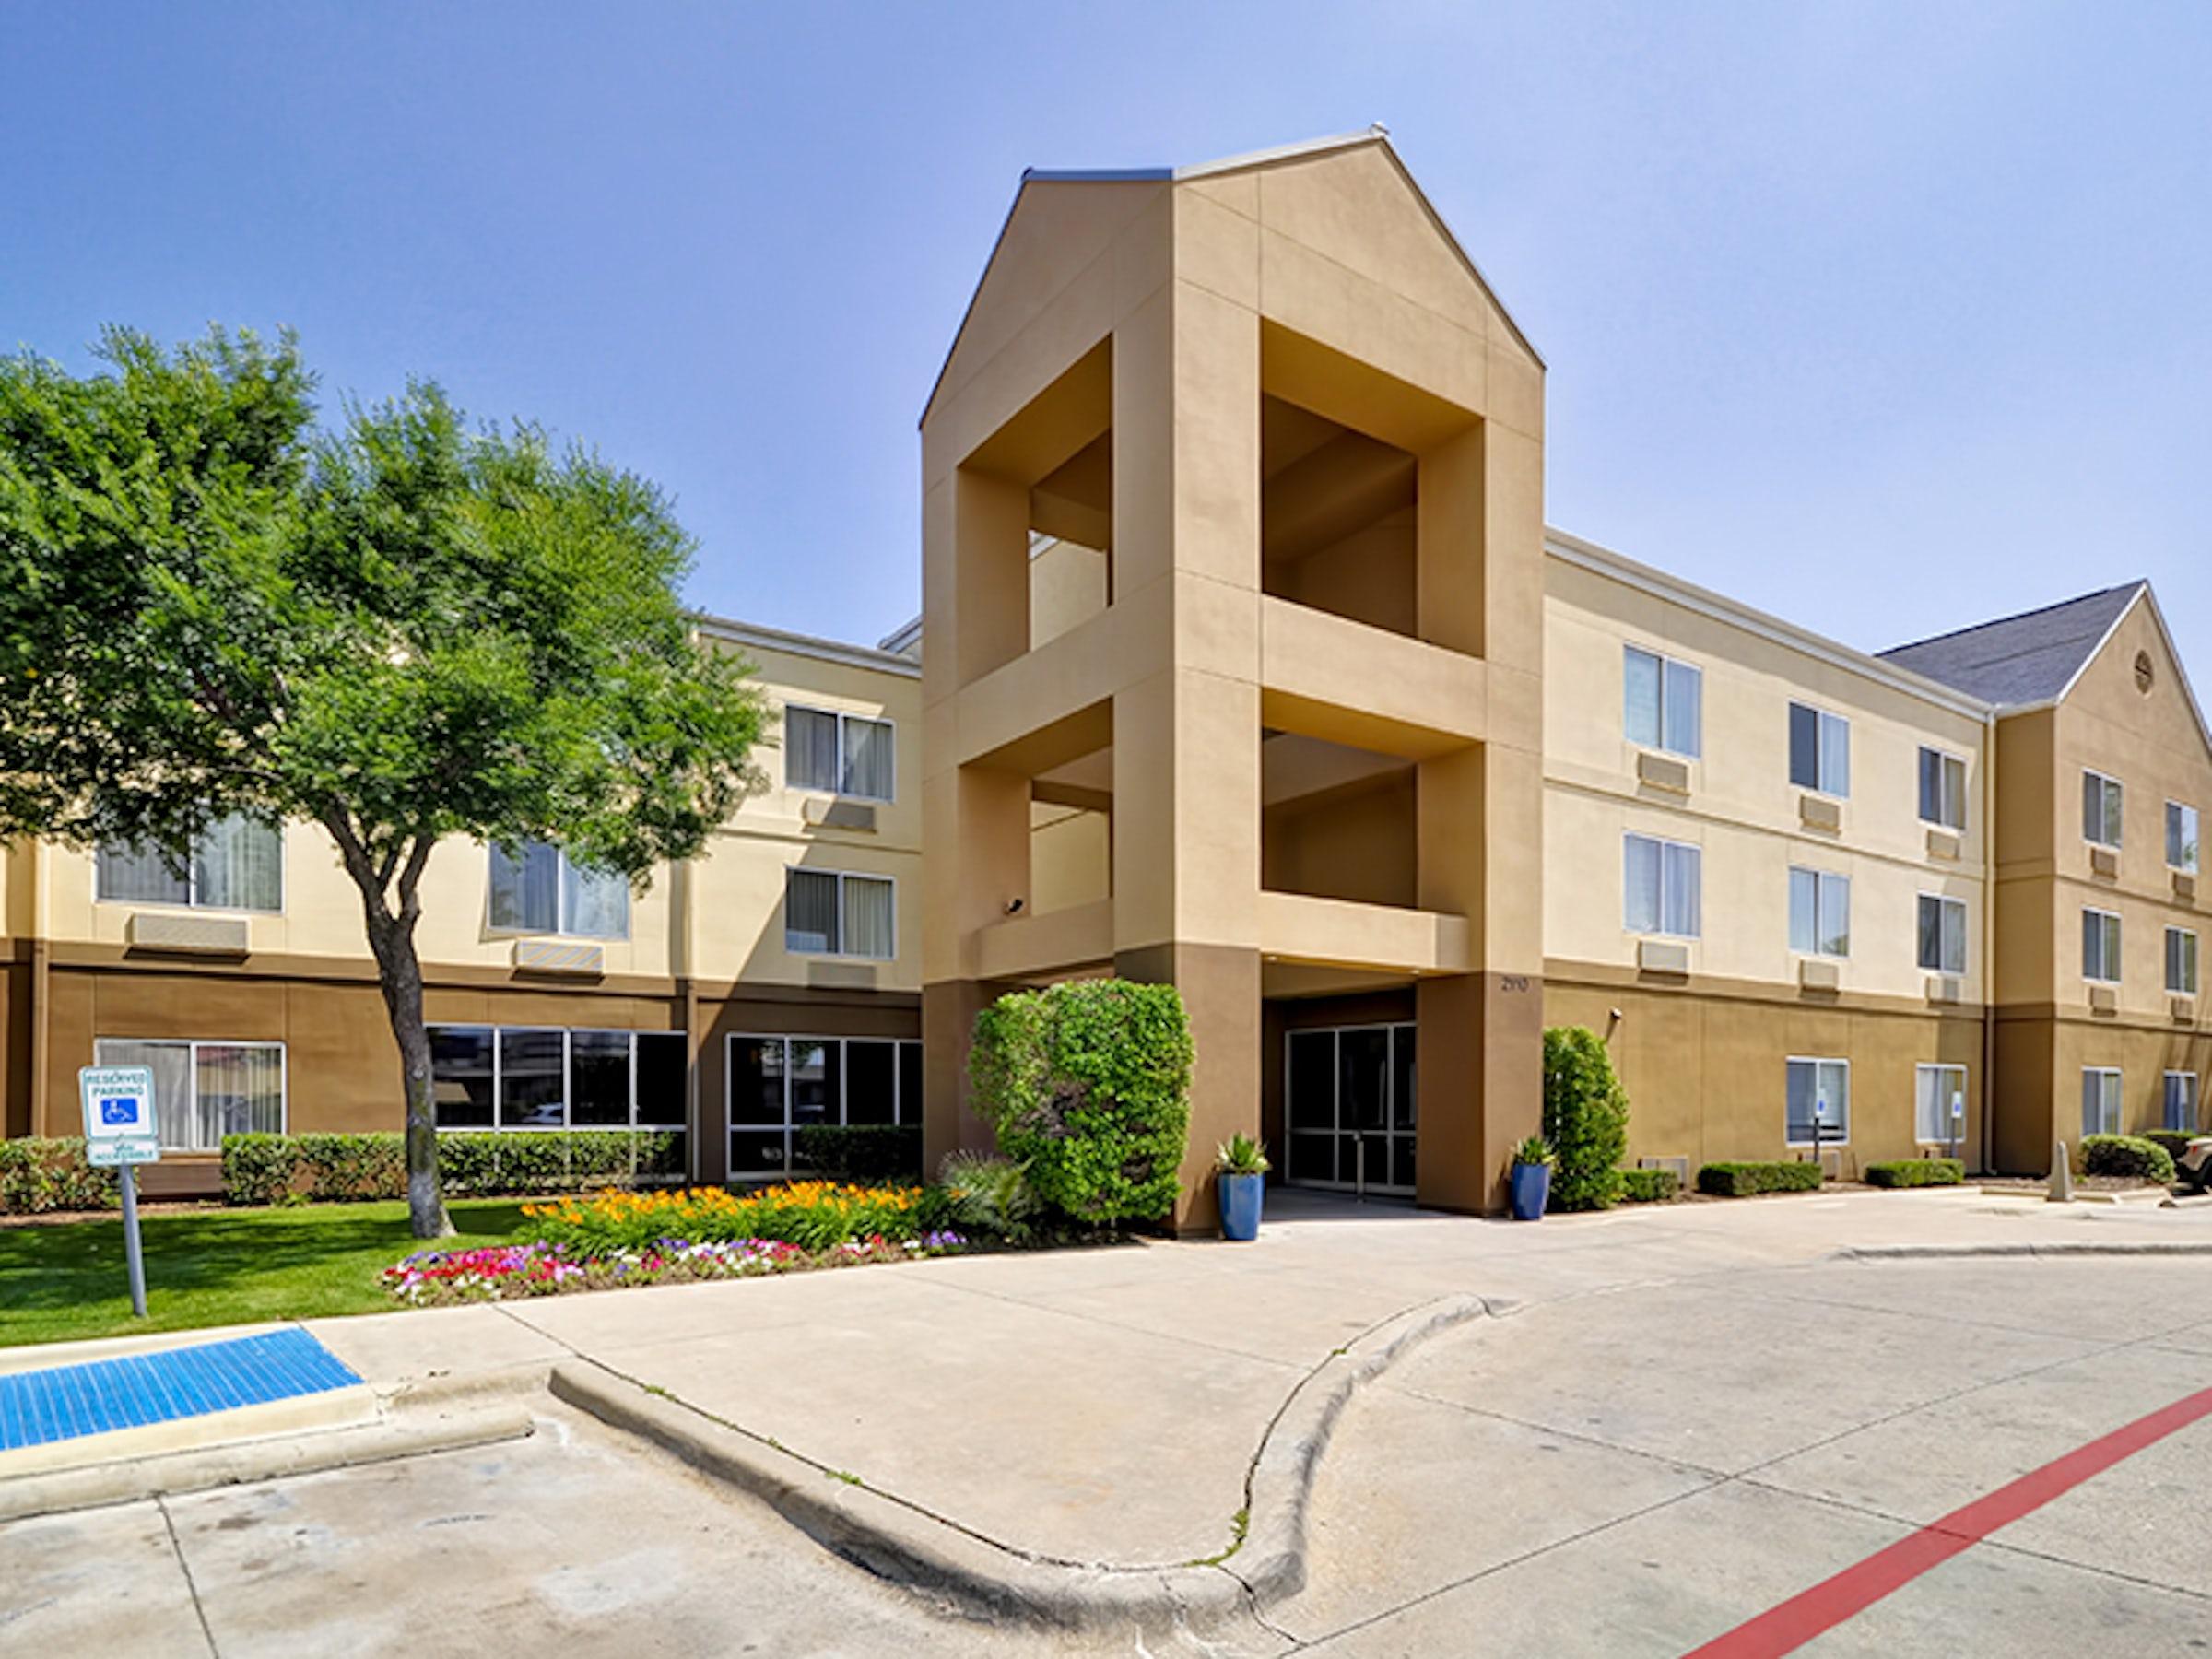 Fairfield Inn & Suites Dallas Medical Market Center in Beyond Dallas